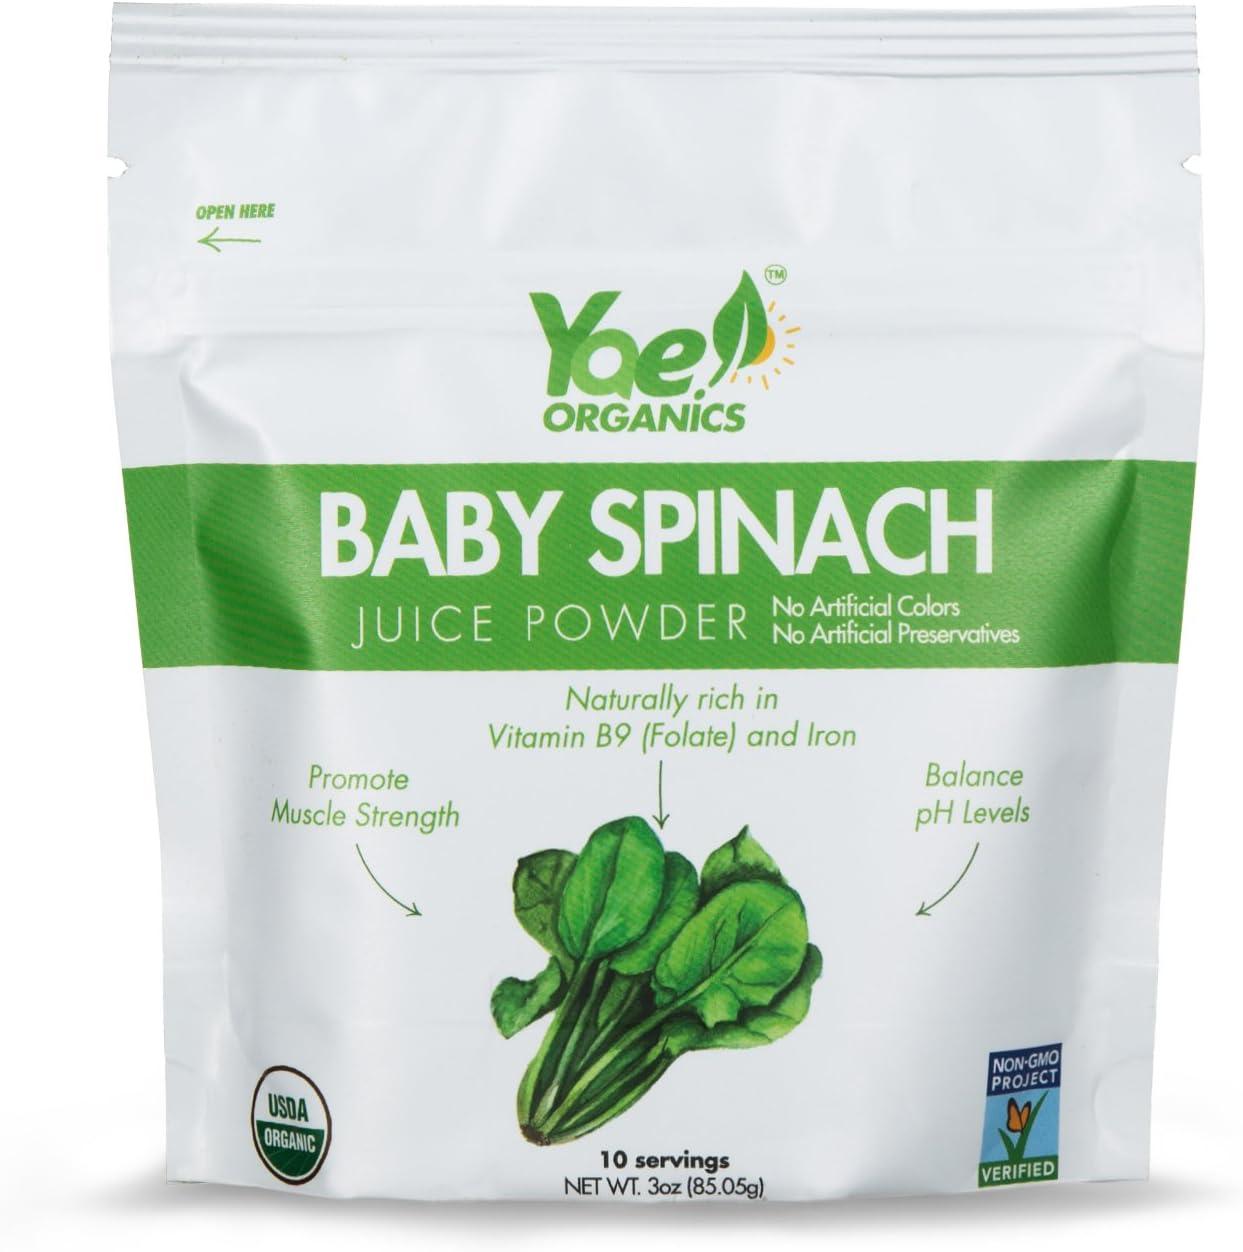 Yae! Organics 3oz/10 Servings Keto Baby Spinach Juice Powder, 100% Pure Vegan, Gluten Free, Non-GMO, A Great Source of Fiber, Iron, Antioxidants, Essential Vitamins, and Minerals